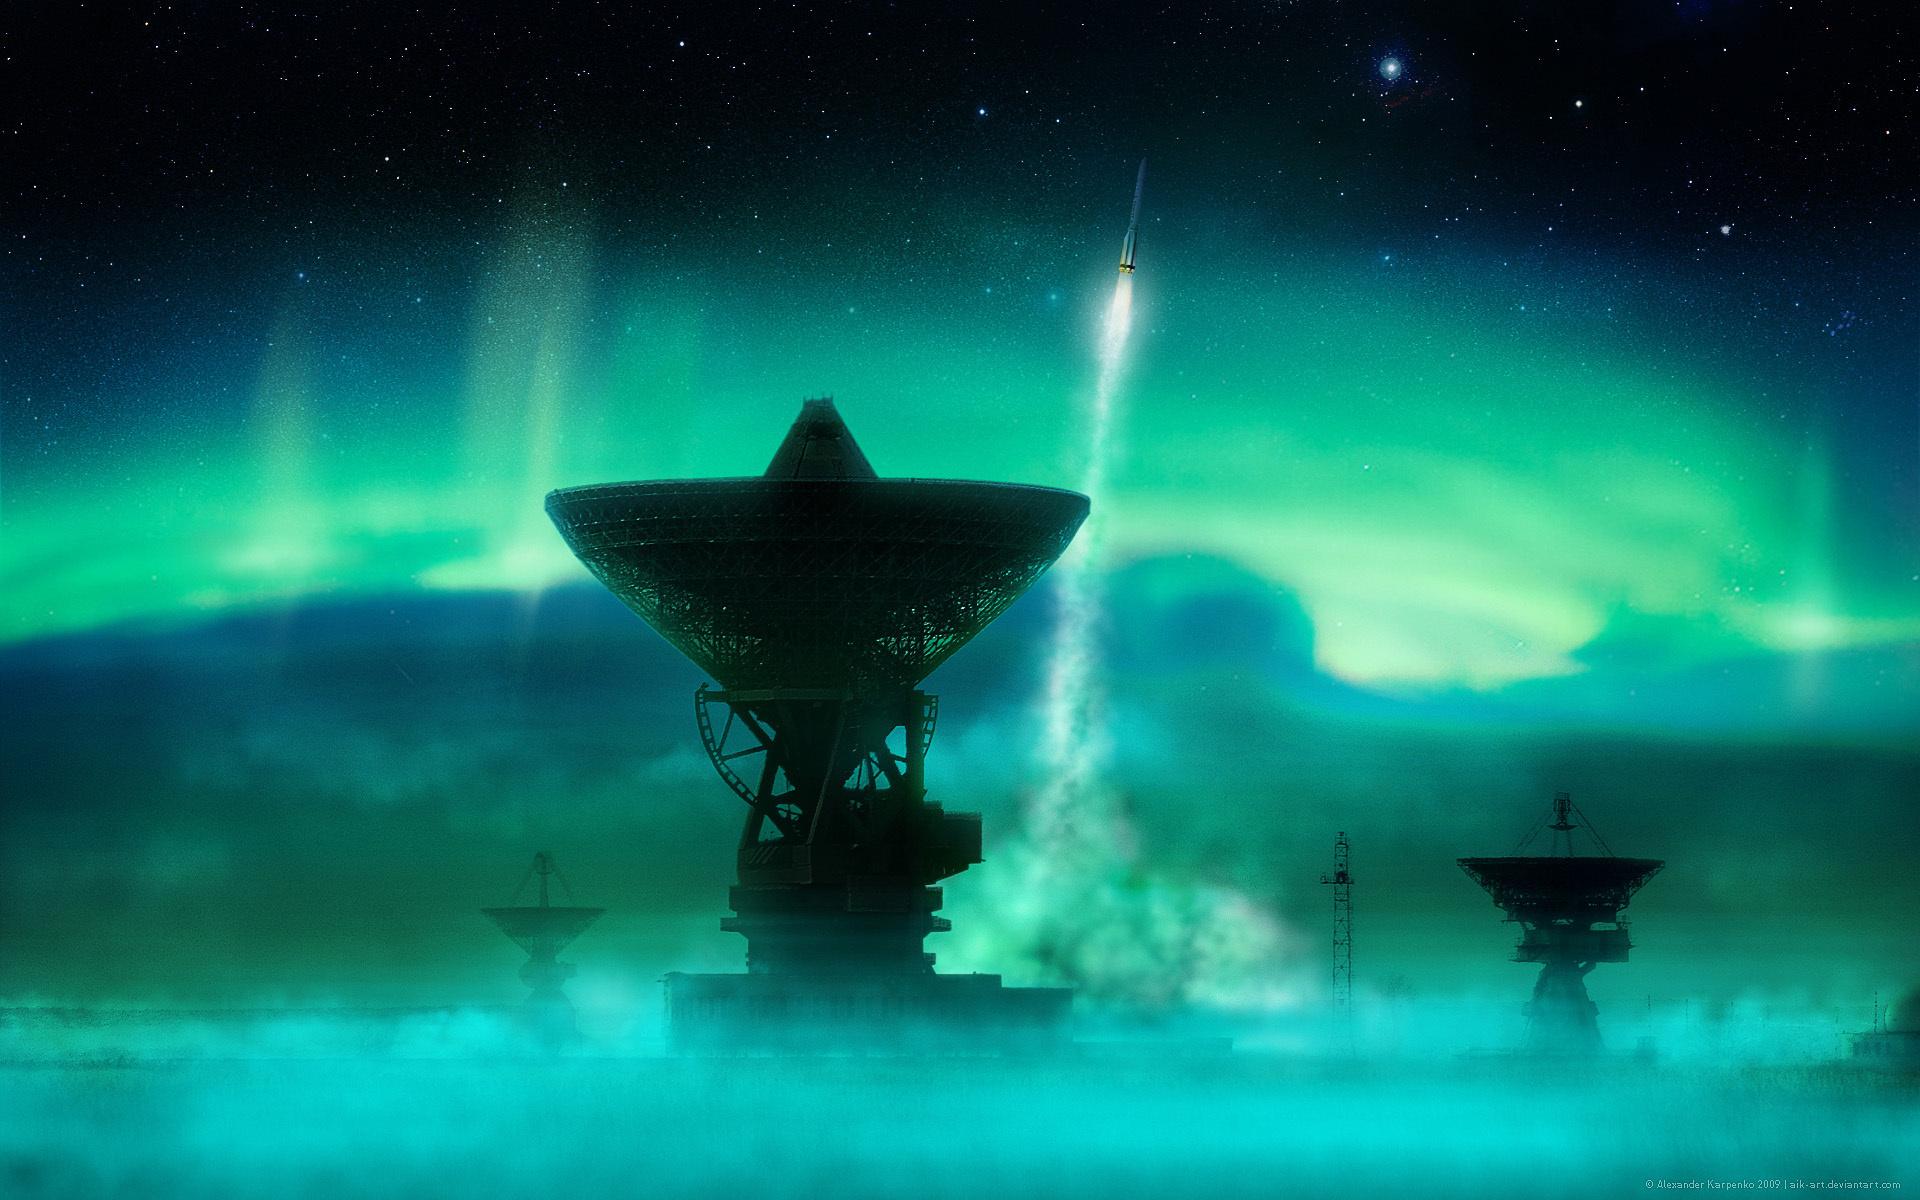 синее сияние, ракеты, антенны, радиотелескоп